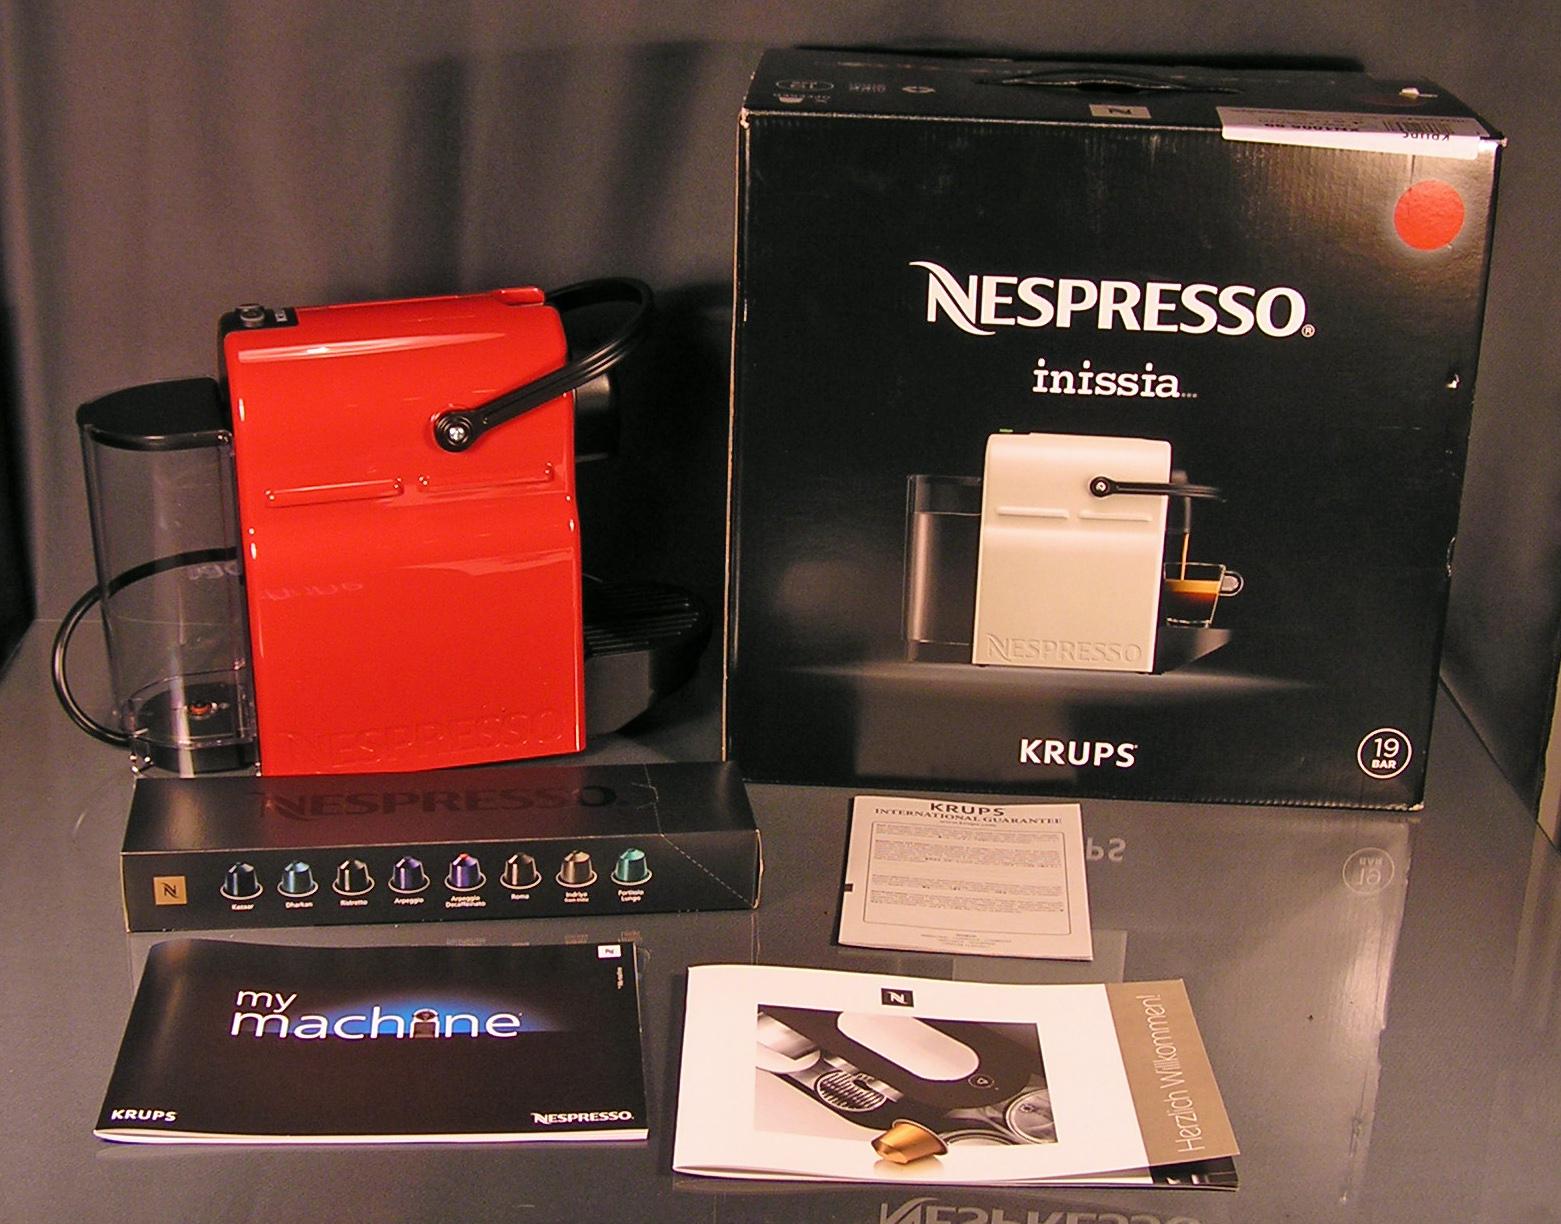 krups nespresso inissia xn1005 ruby red kapselmaschine rot. Black Bedroom Furniture Sets. Home Design Ideas